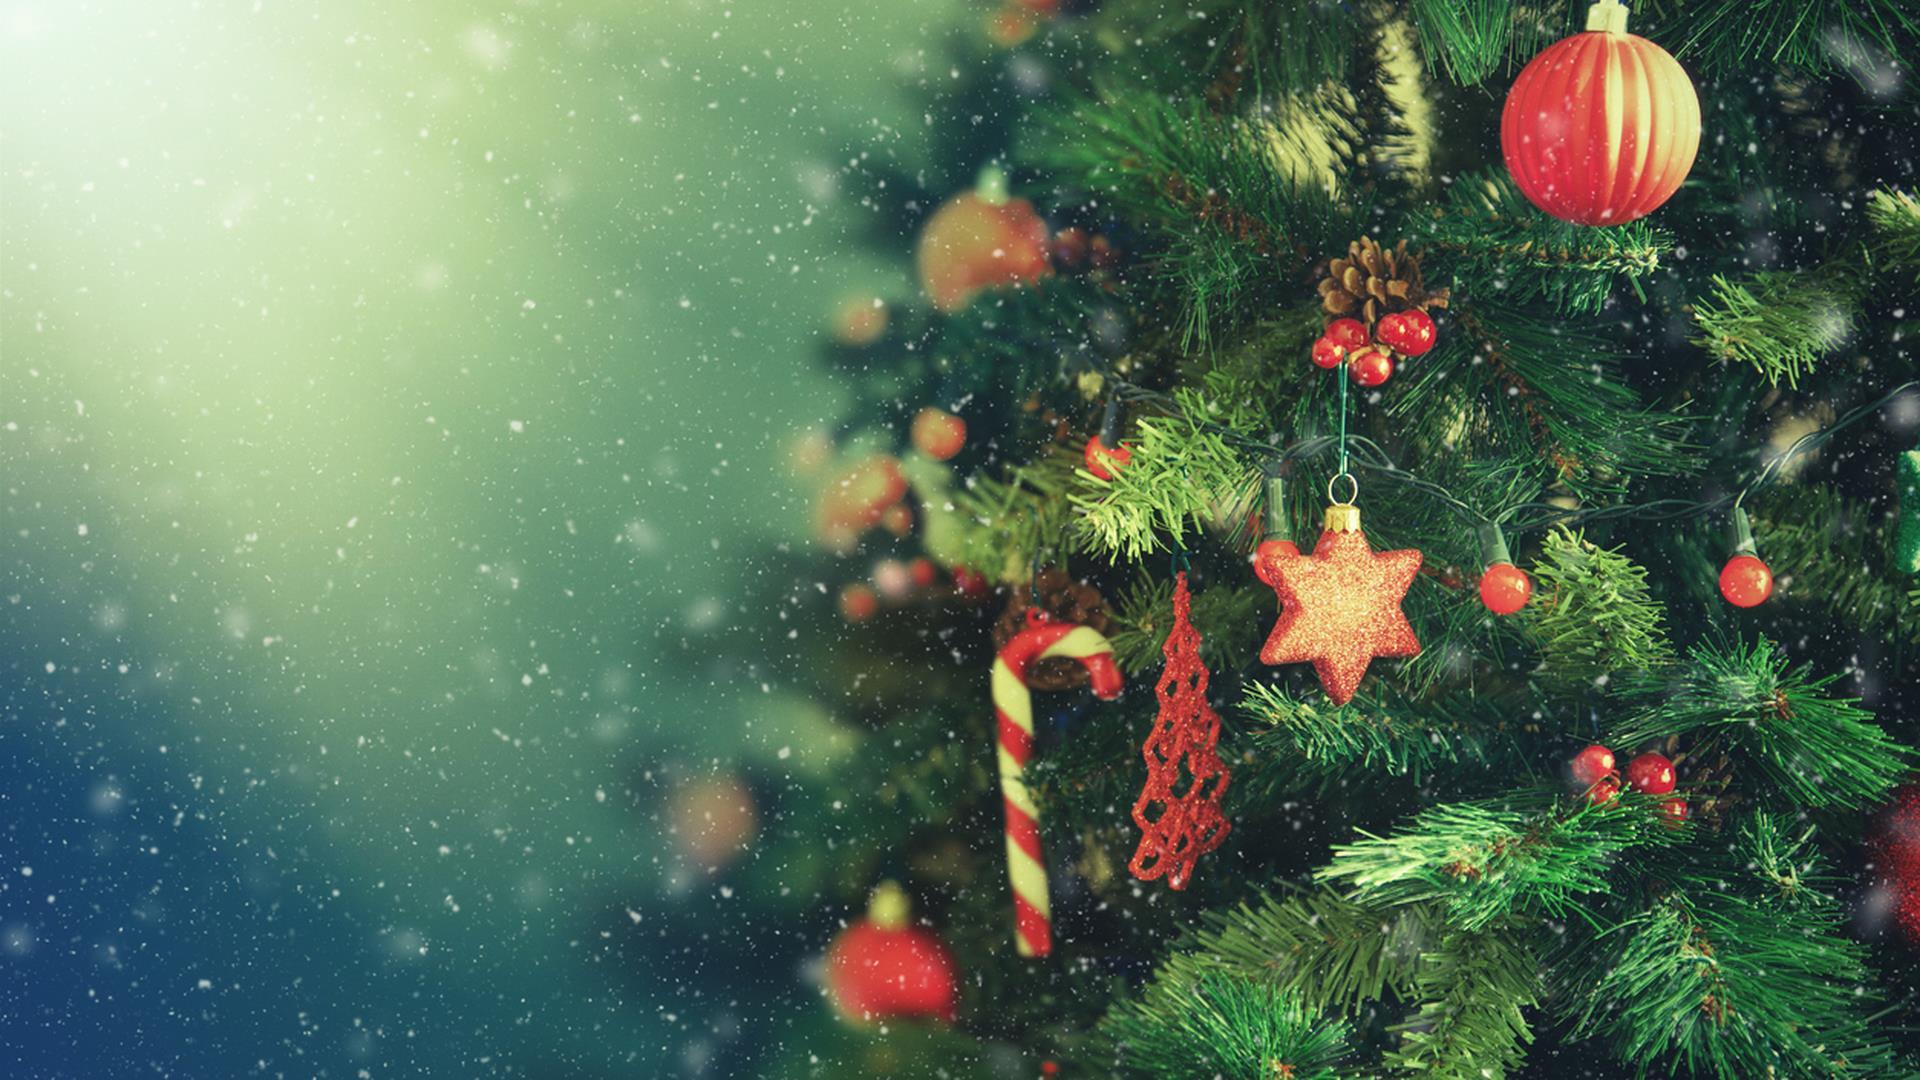 Immagini Di Natale Per Amici.Frasi Di Natale Auguri E Aforismi Per Amici Famigliari E Colleghi